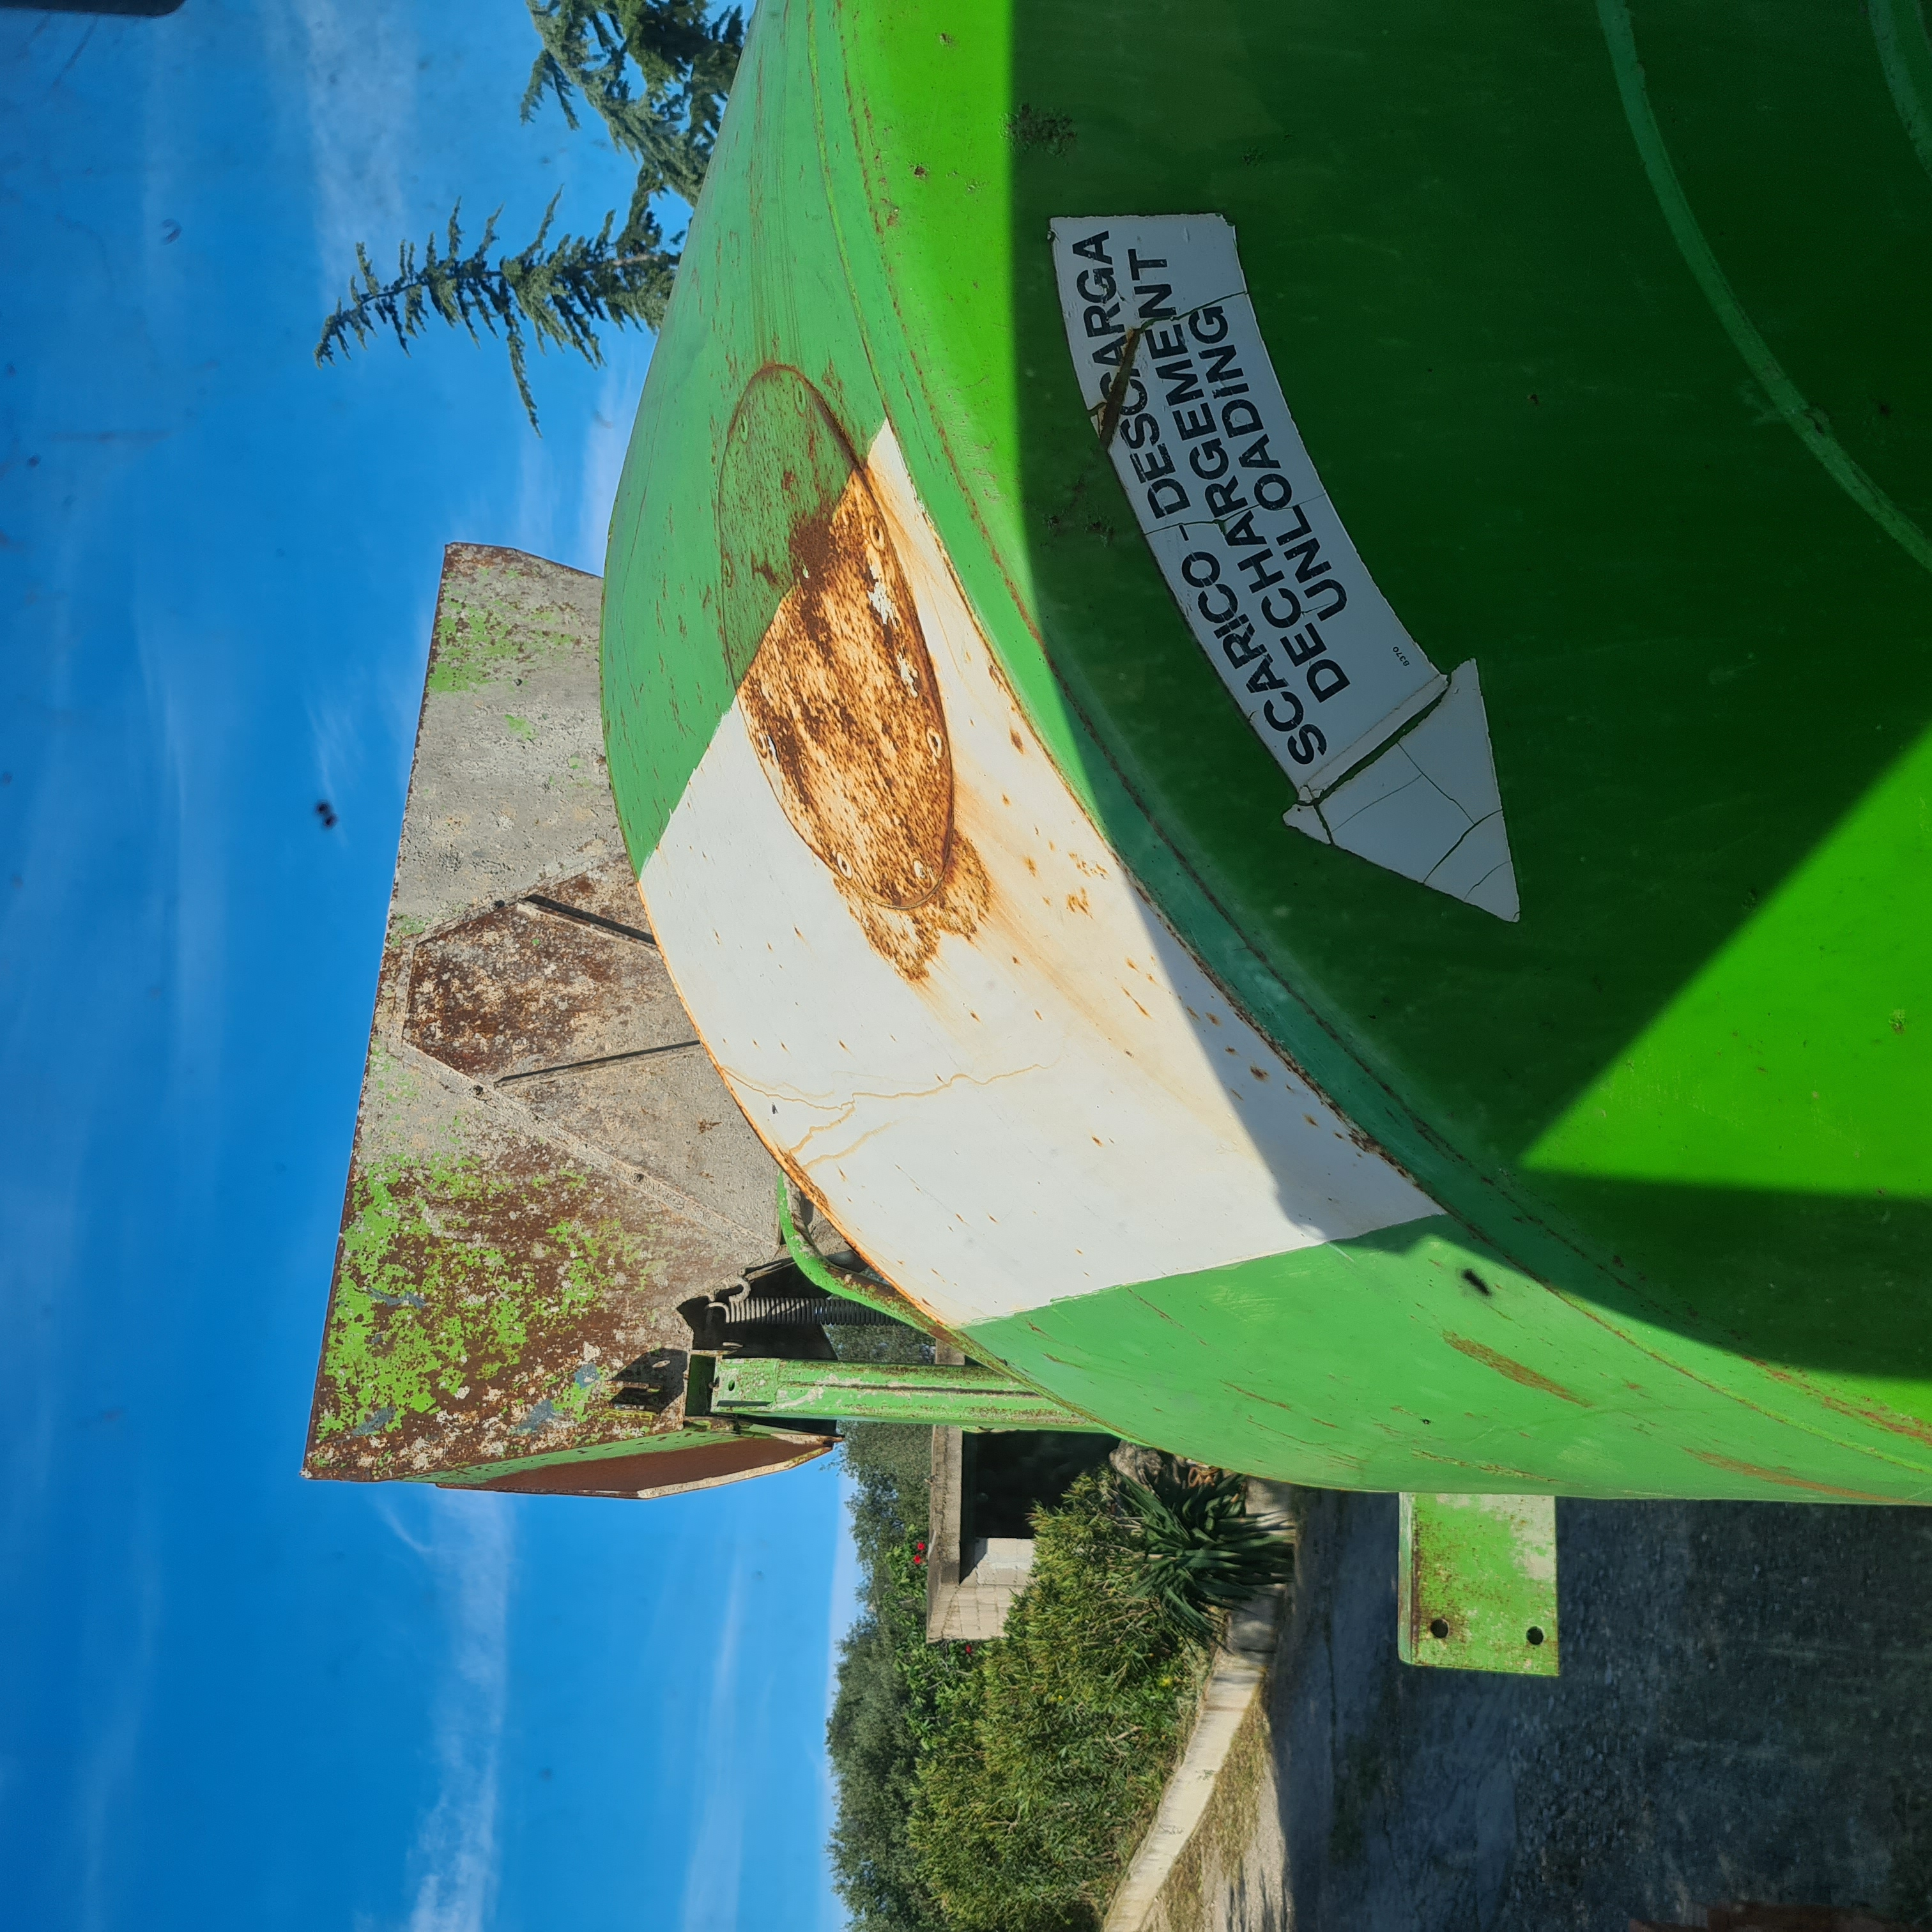 Merlo dumper betoniera dbm 2500 in vendita - foto 4